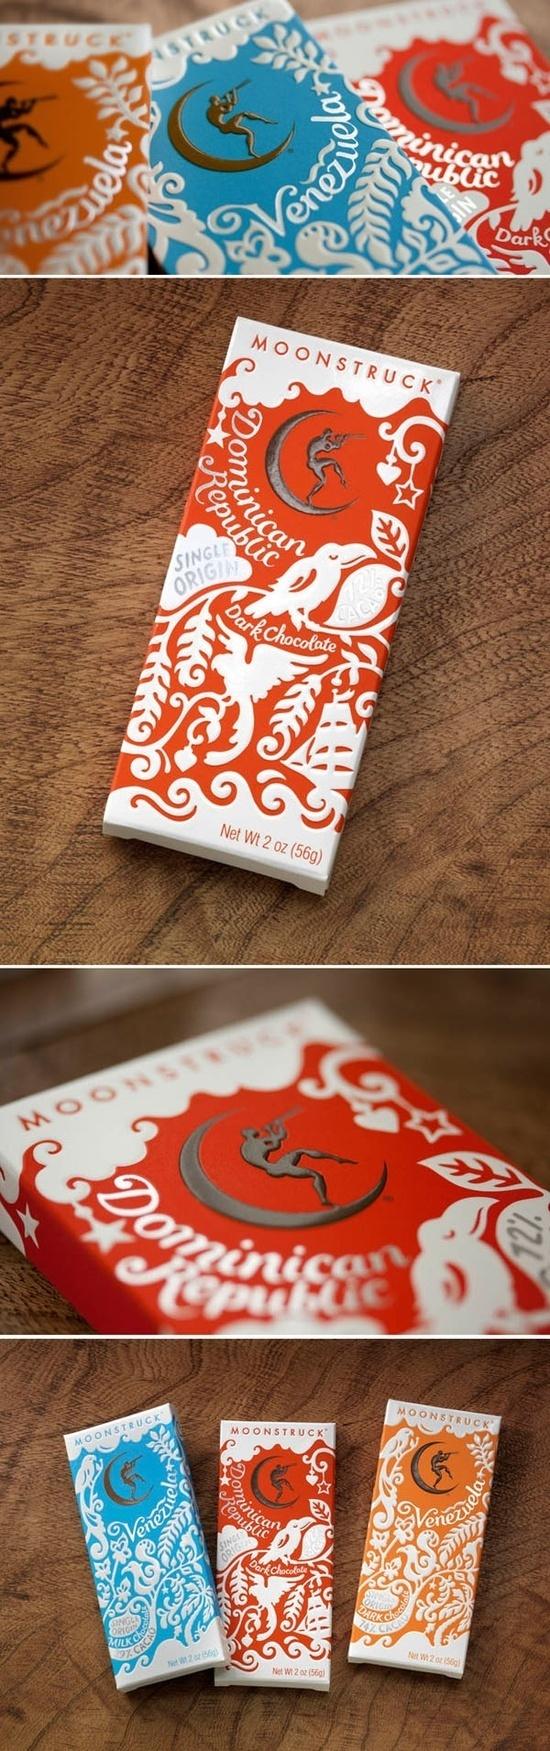 Moonstruck Chocolate #packaging #design